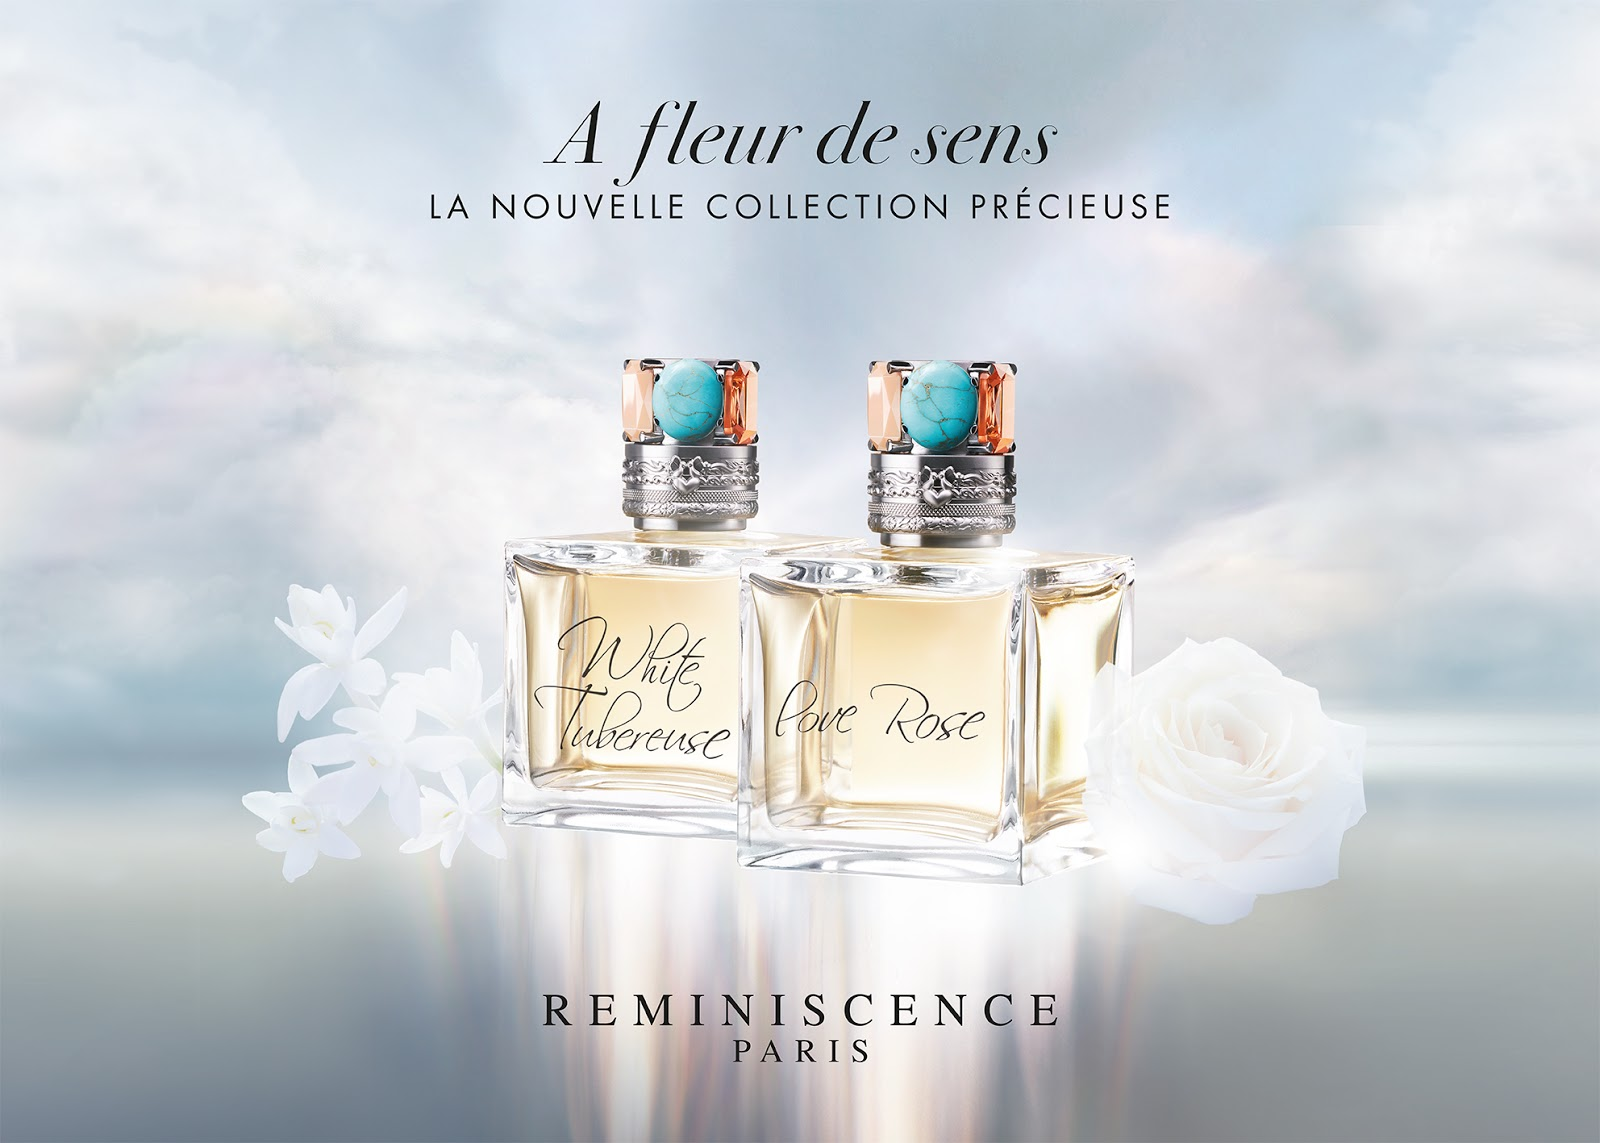 De K3uft1cjl Rosele Parfum Nouveau Love Reminiscence Ib7Yyv6gf